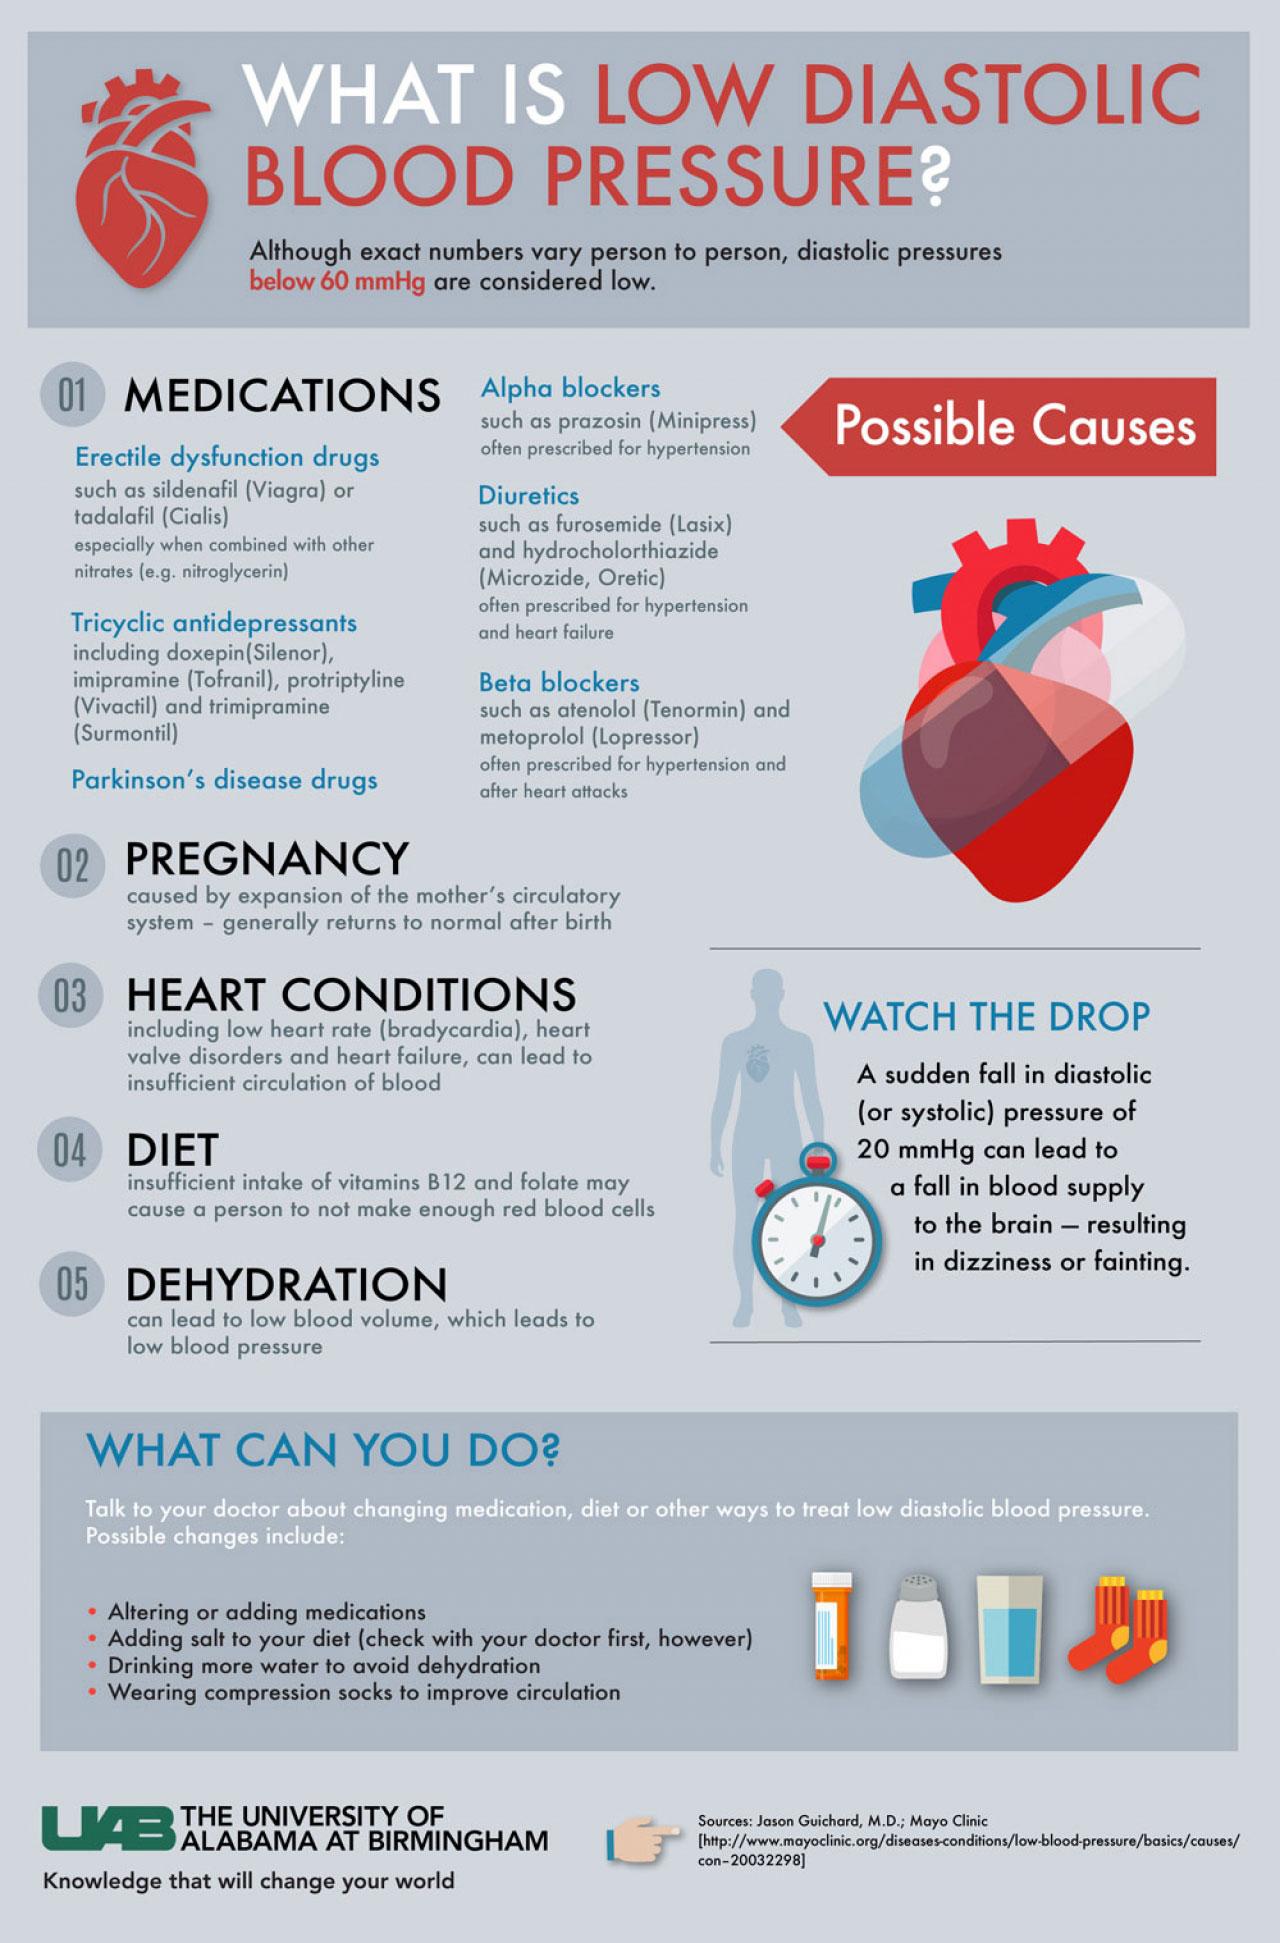 UAB - News - What is low diastolic blood pressure?